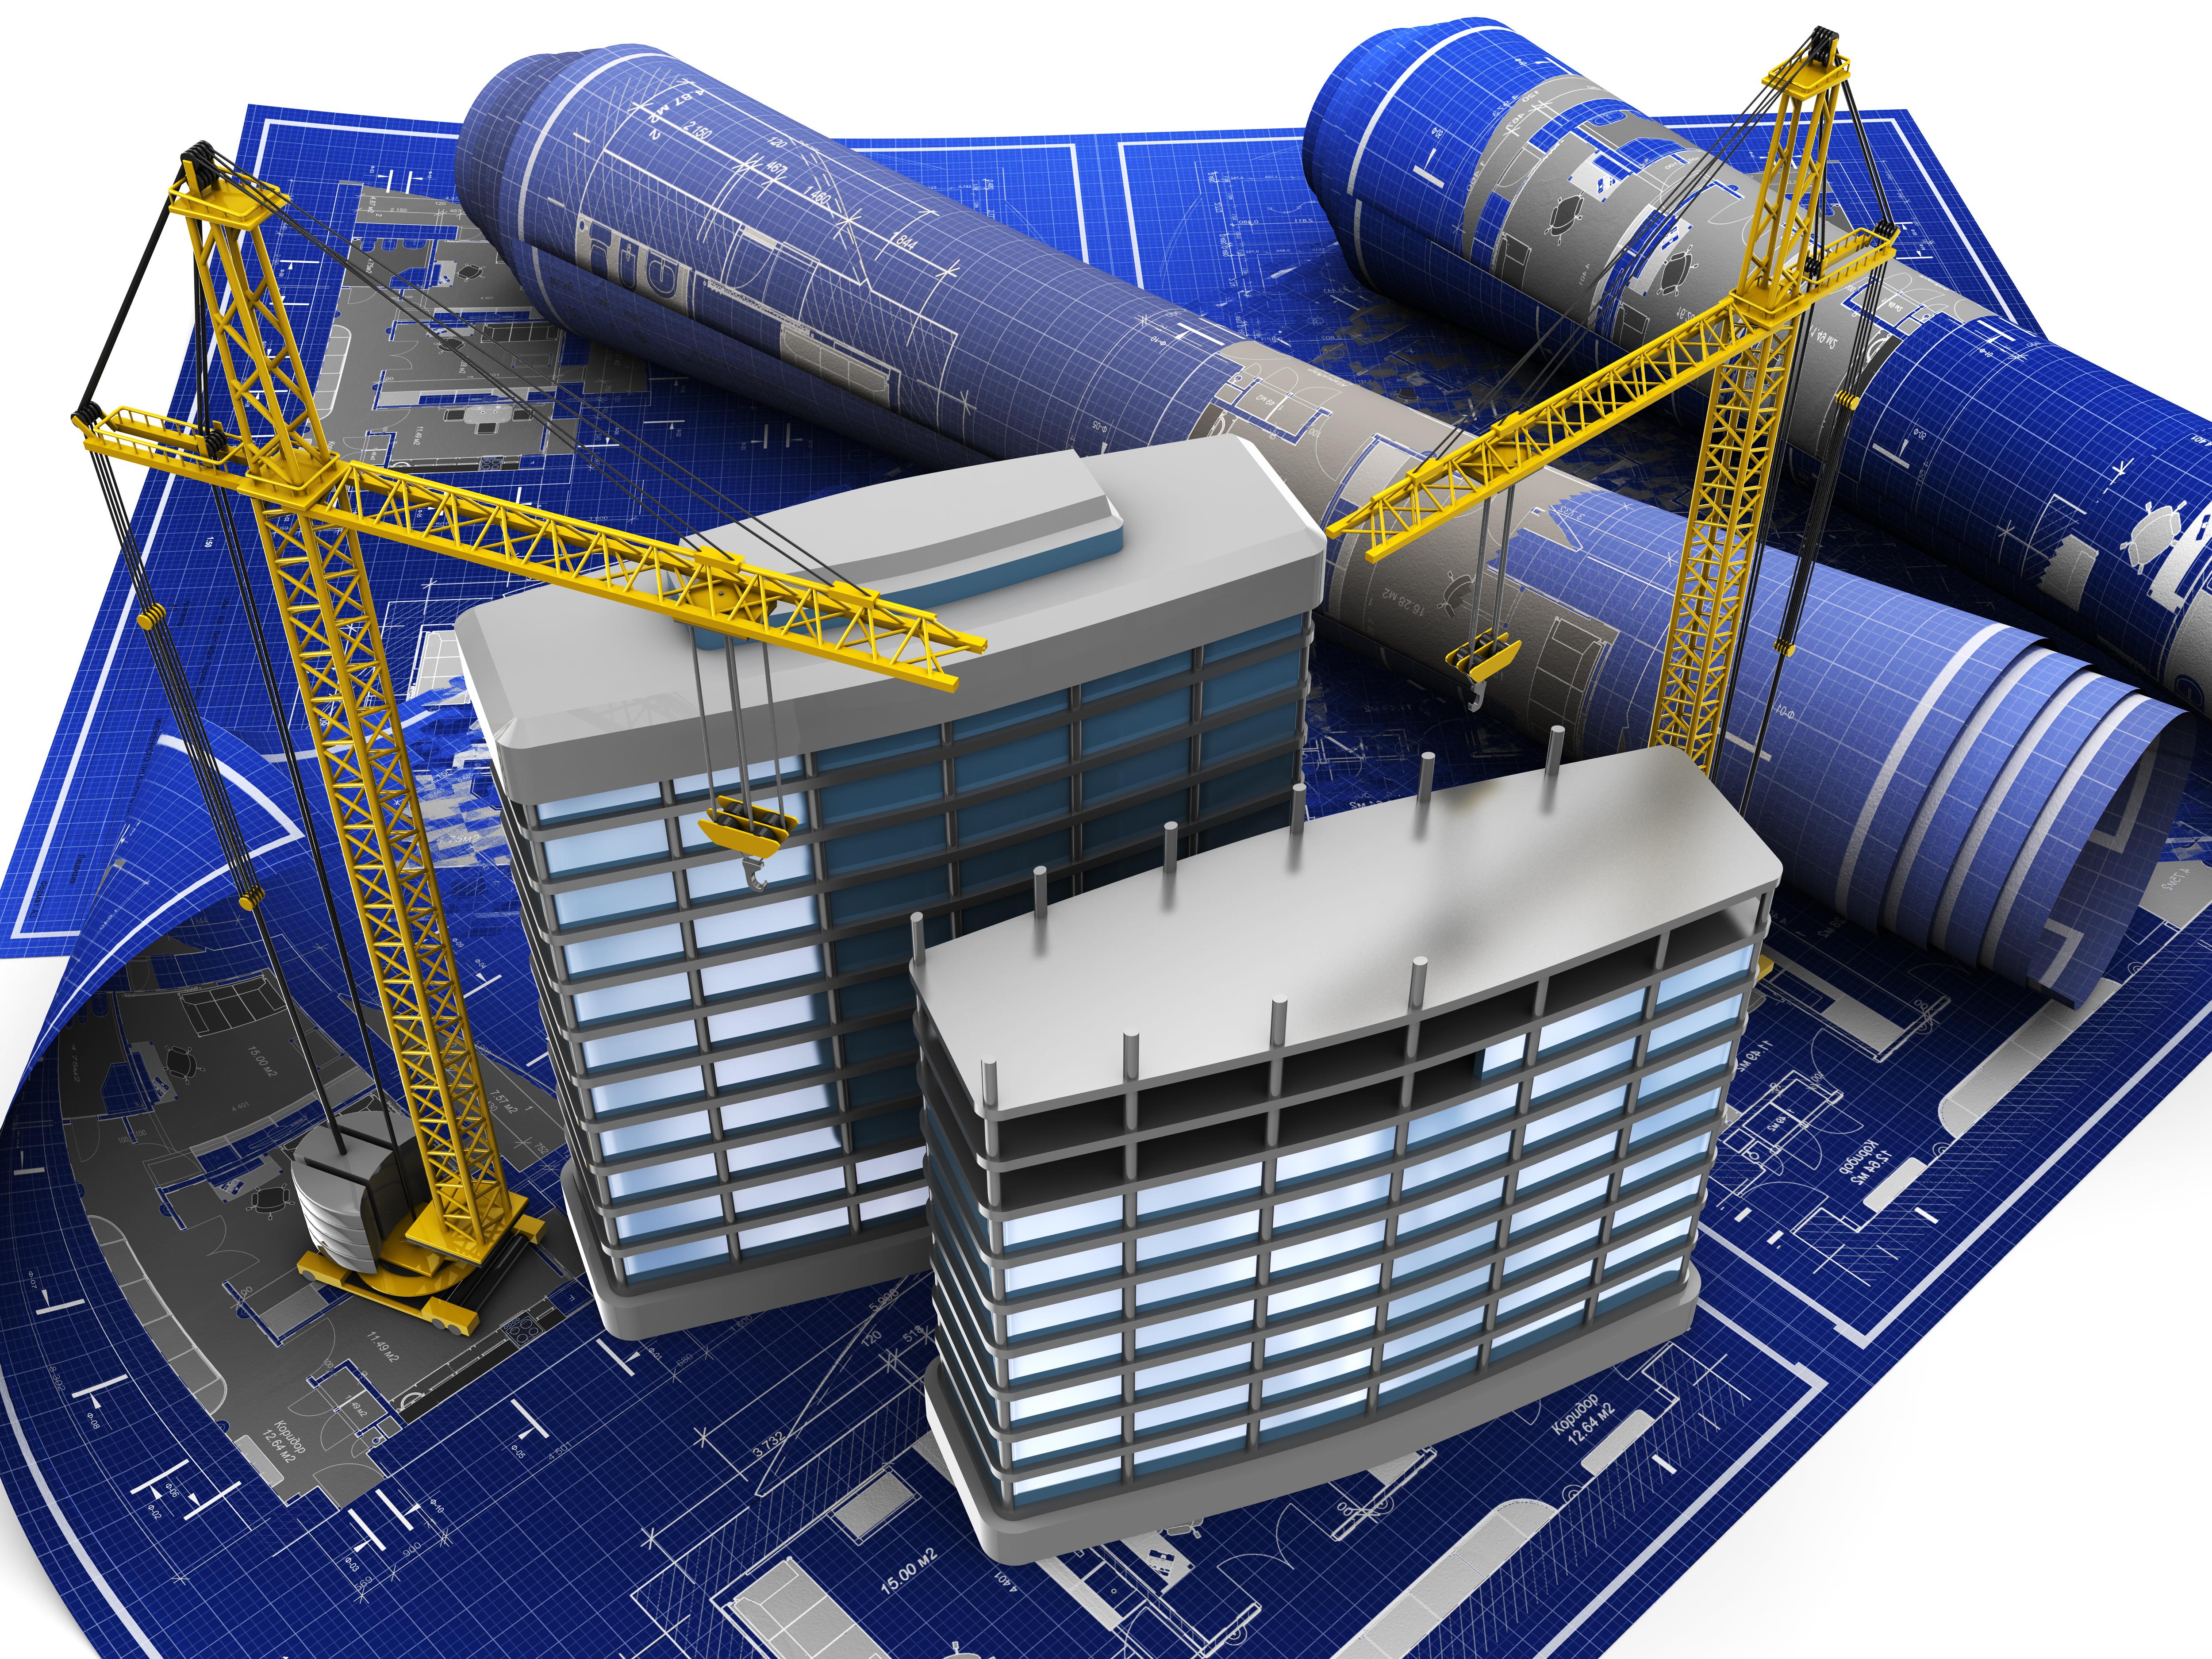 Hardware Construction